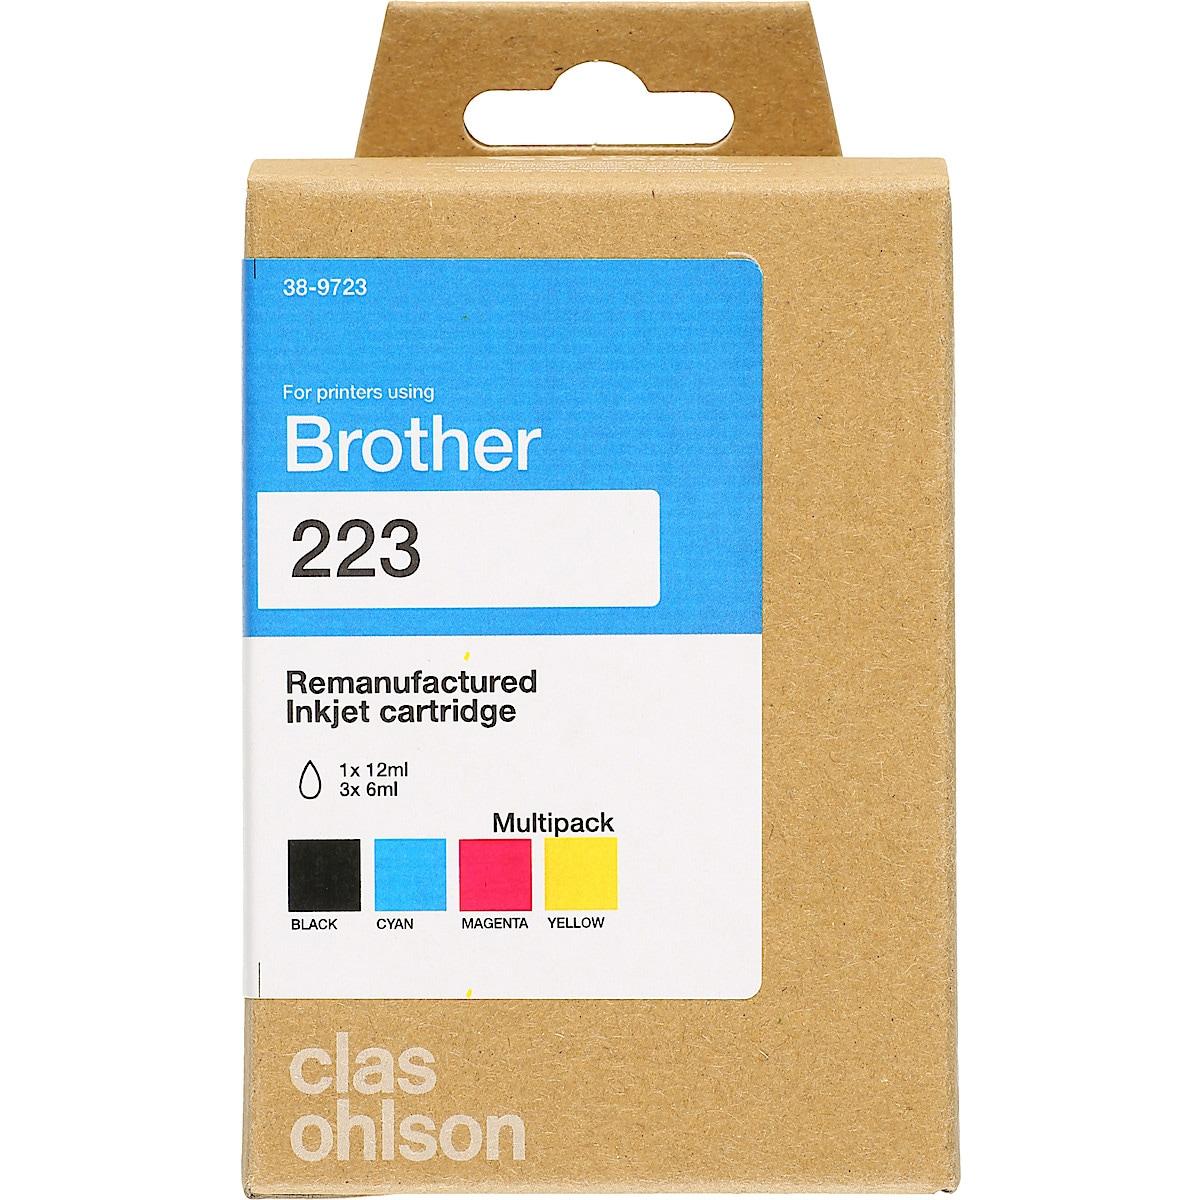 Brother LC 223 bläckpatron multipack XL, Clas Ohlson